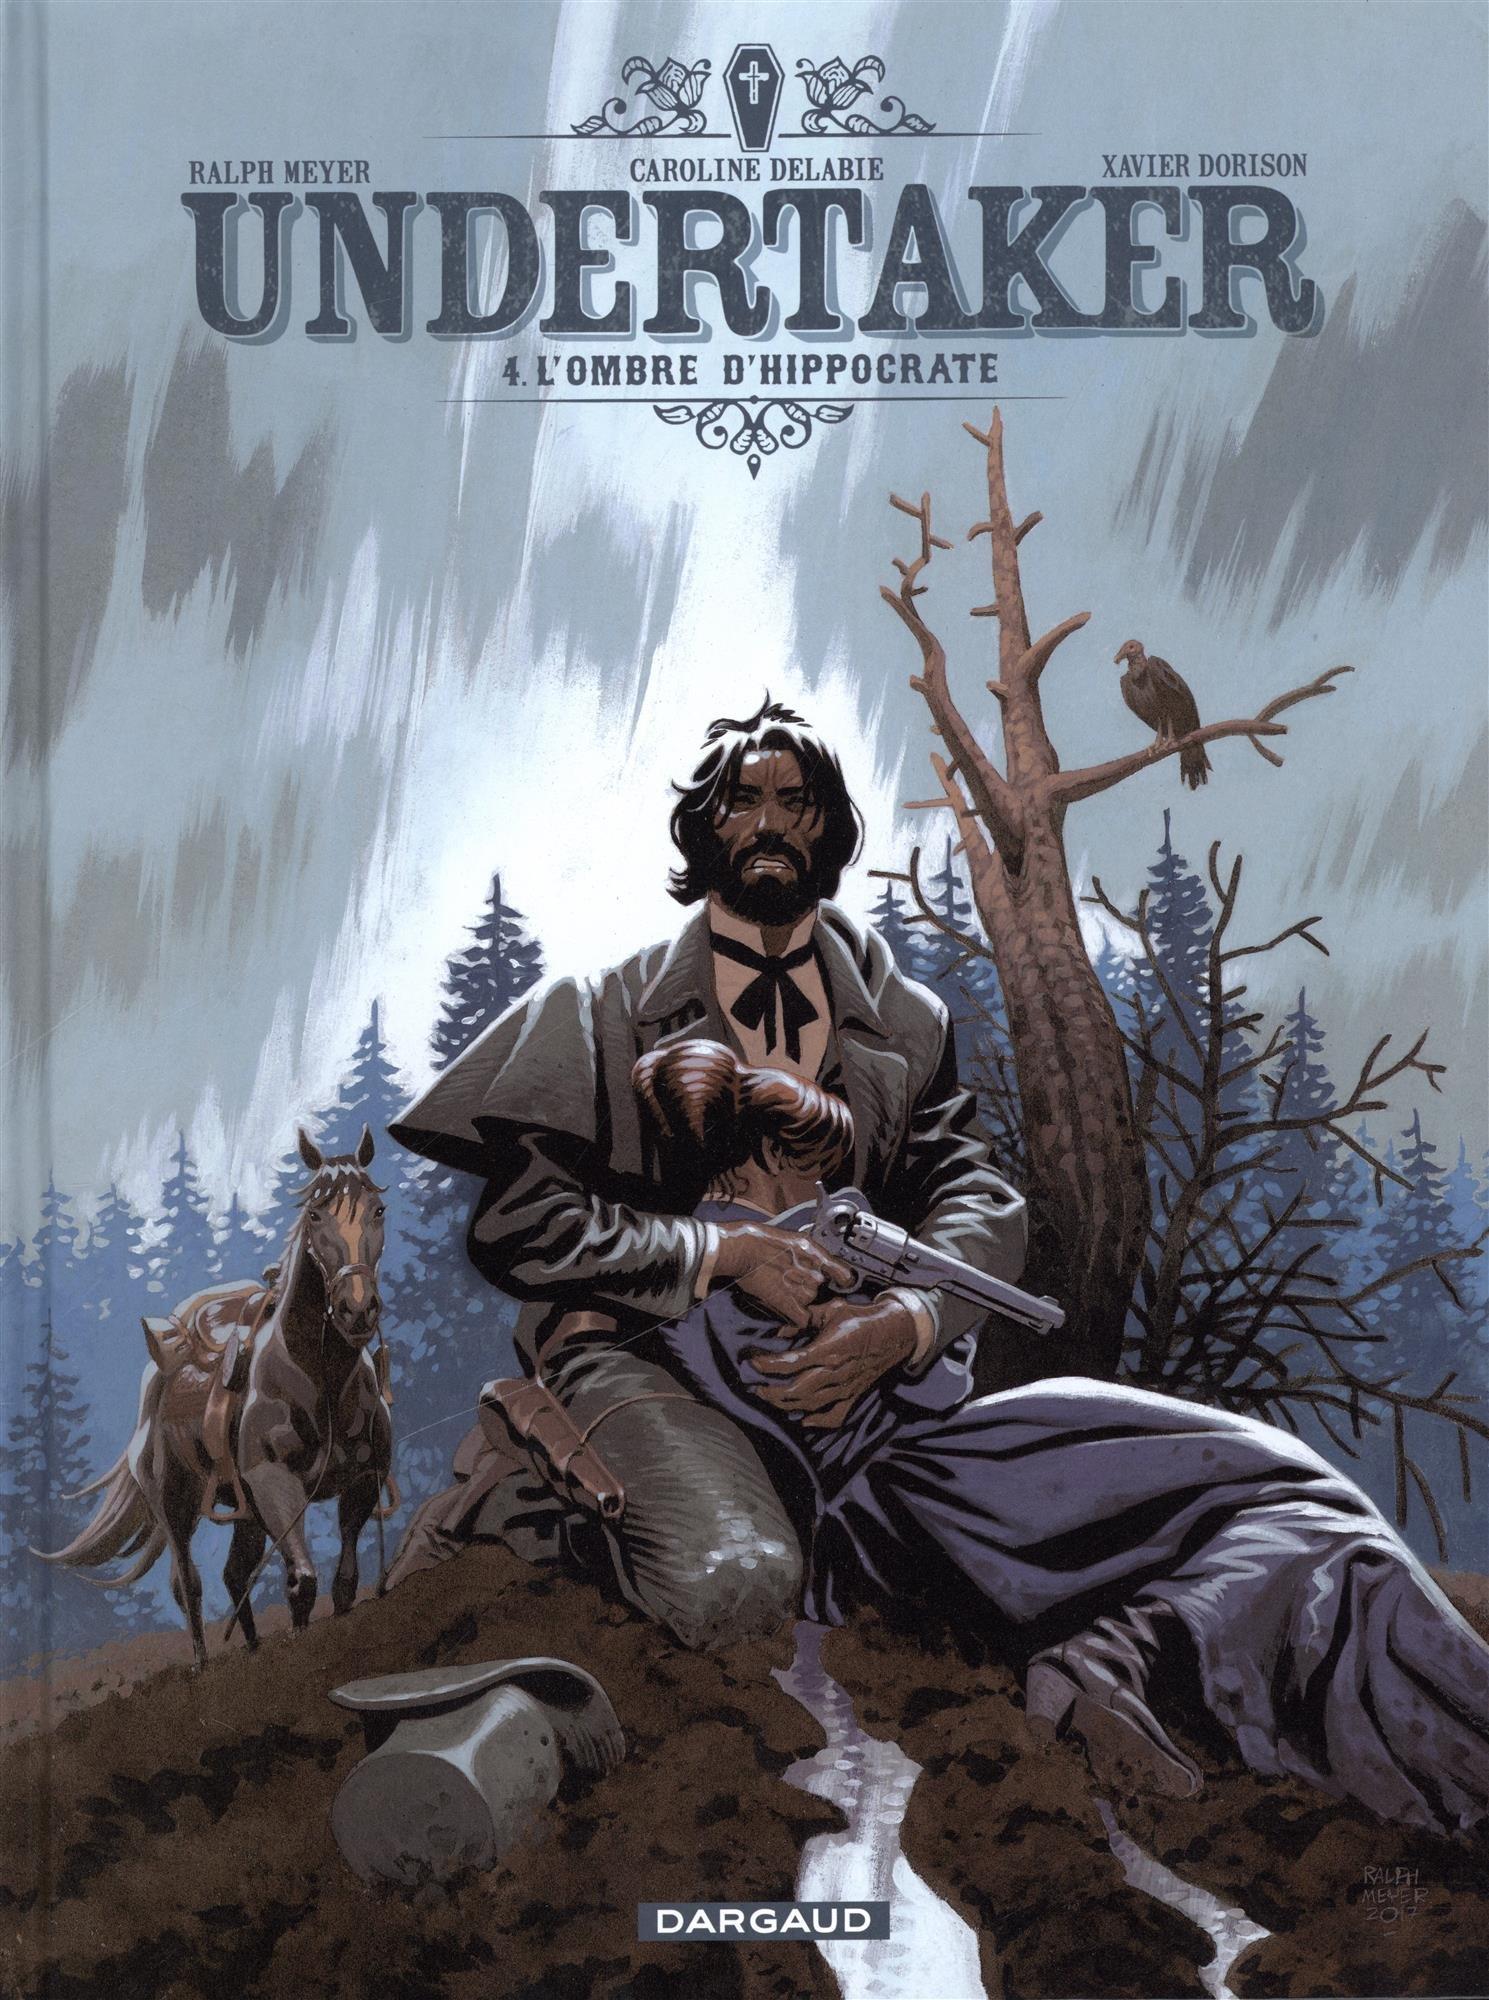 Undertaker - tome 4 - L'Ombre d'Hippocrate Album – 24 novembre 2017 Dorison Xavier Meyer Ralph Dargaud 2505068208